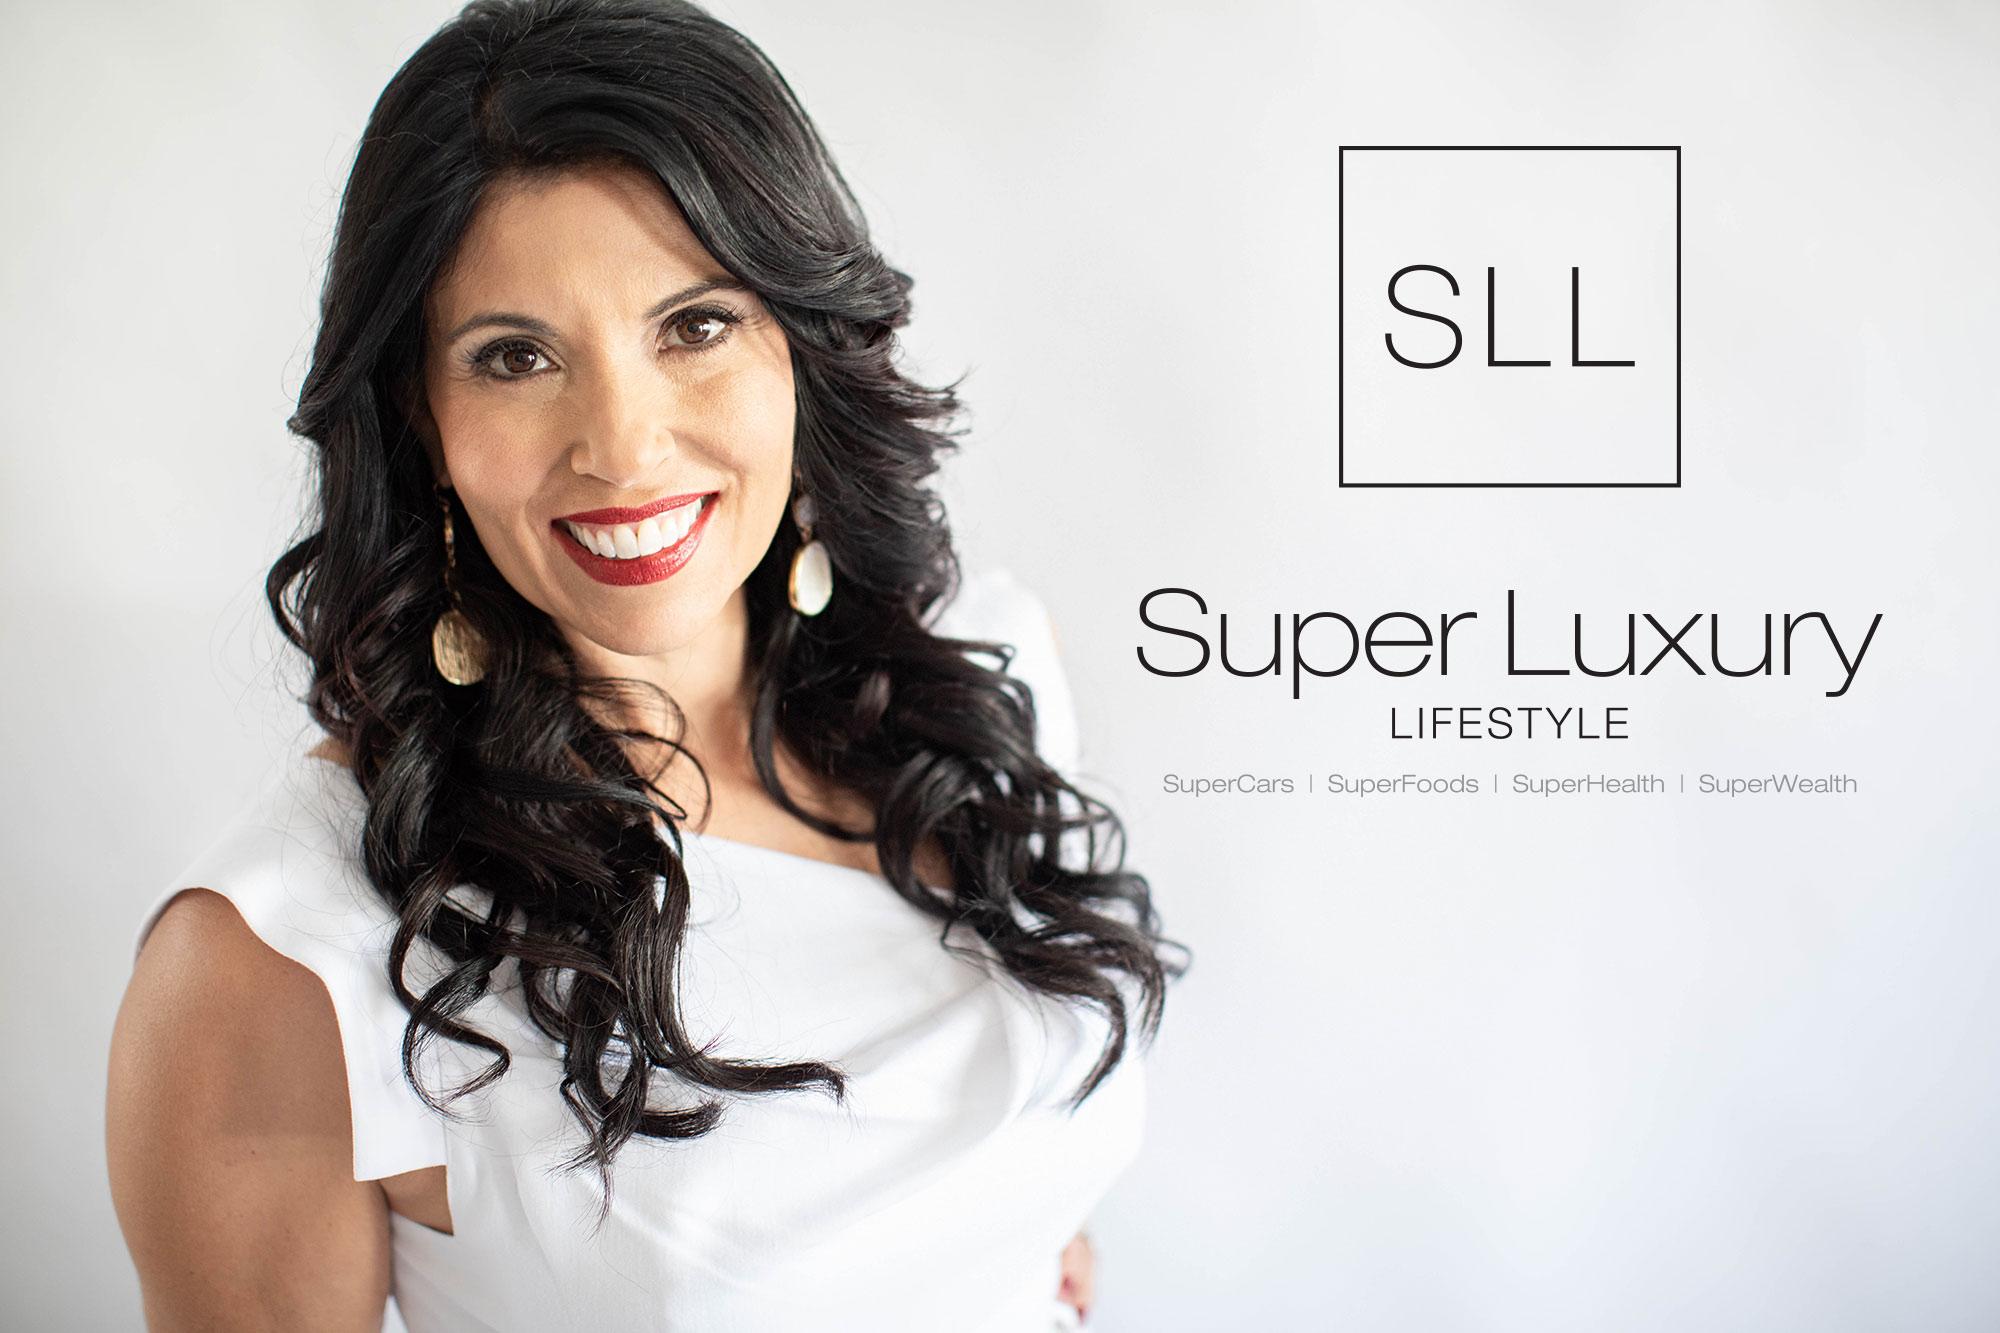 Super Luxury Lifestyle 20 2